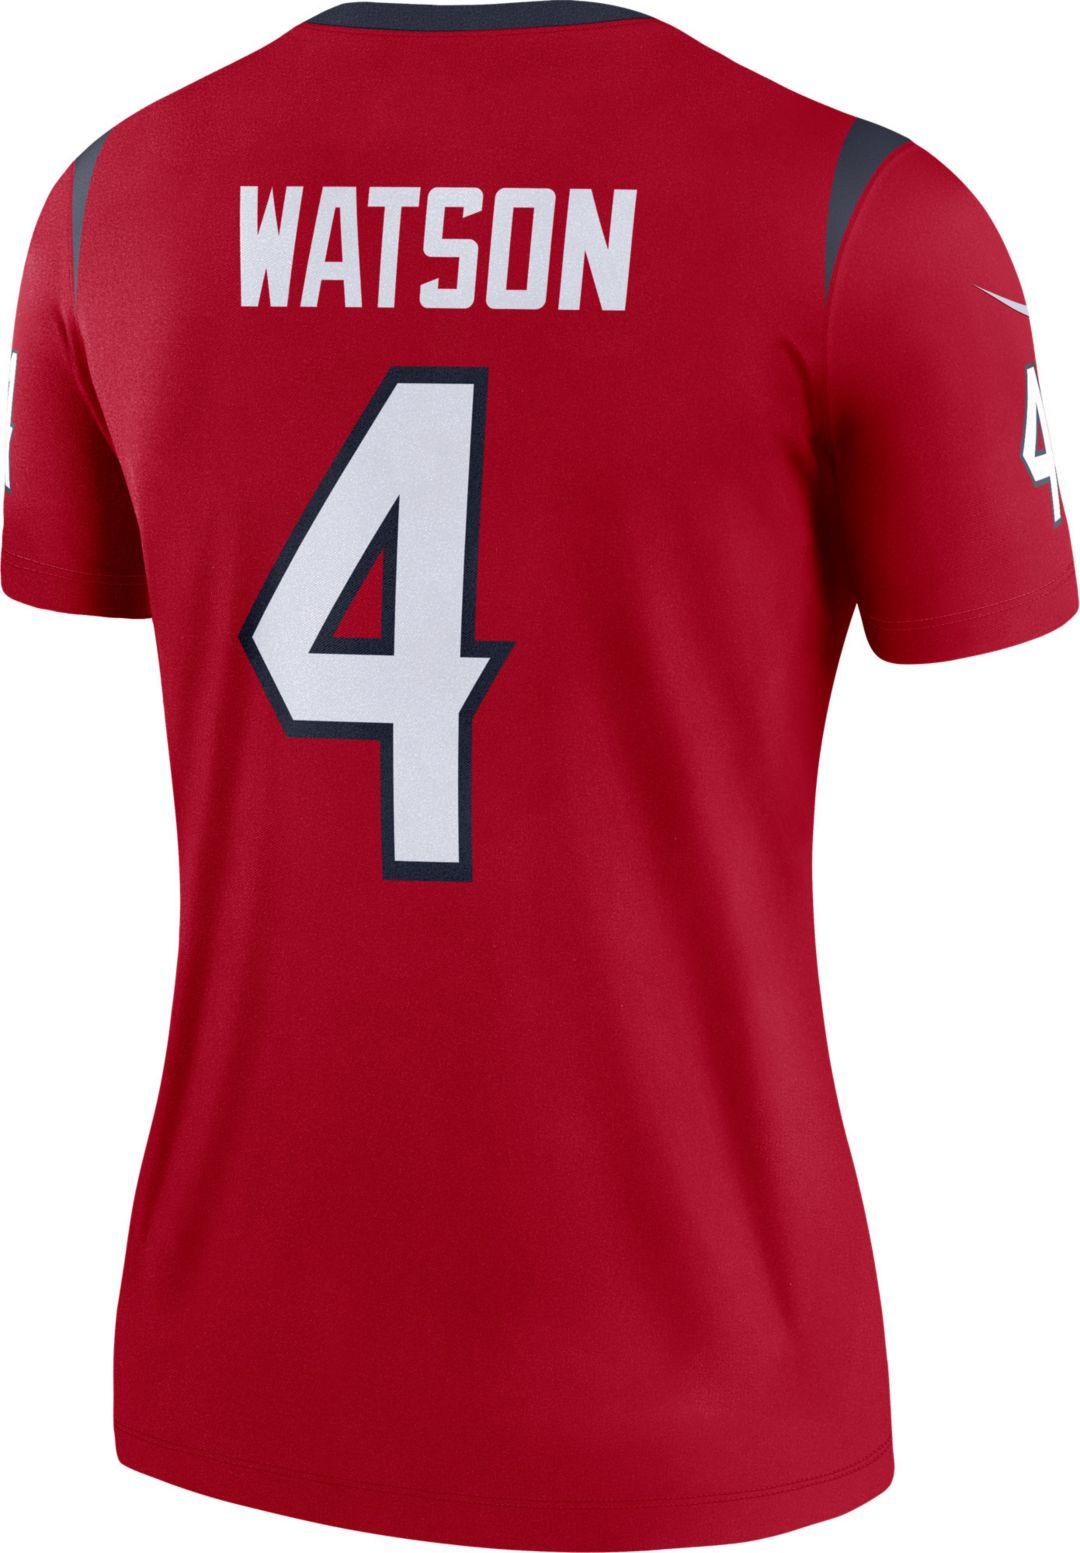 los angeles 5fbe3 83b63 Nike Women's Home Legend Jersey Houston Texans Deshaun Watson #4